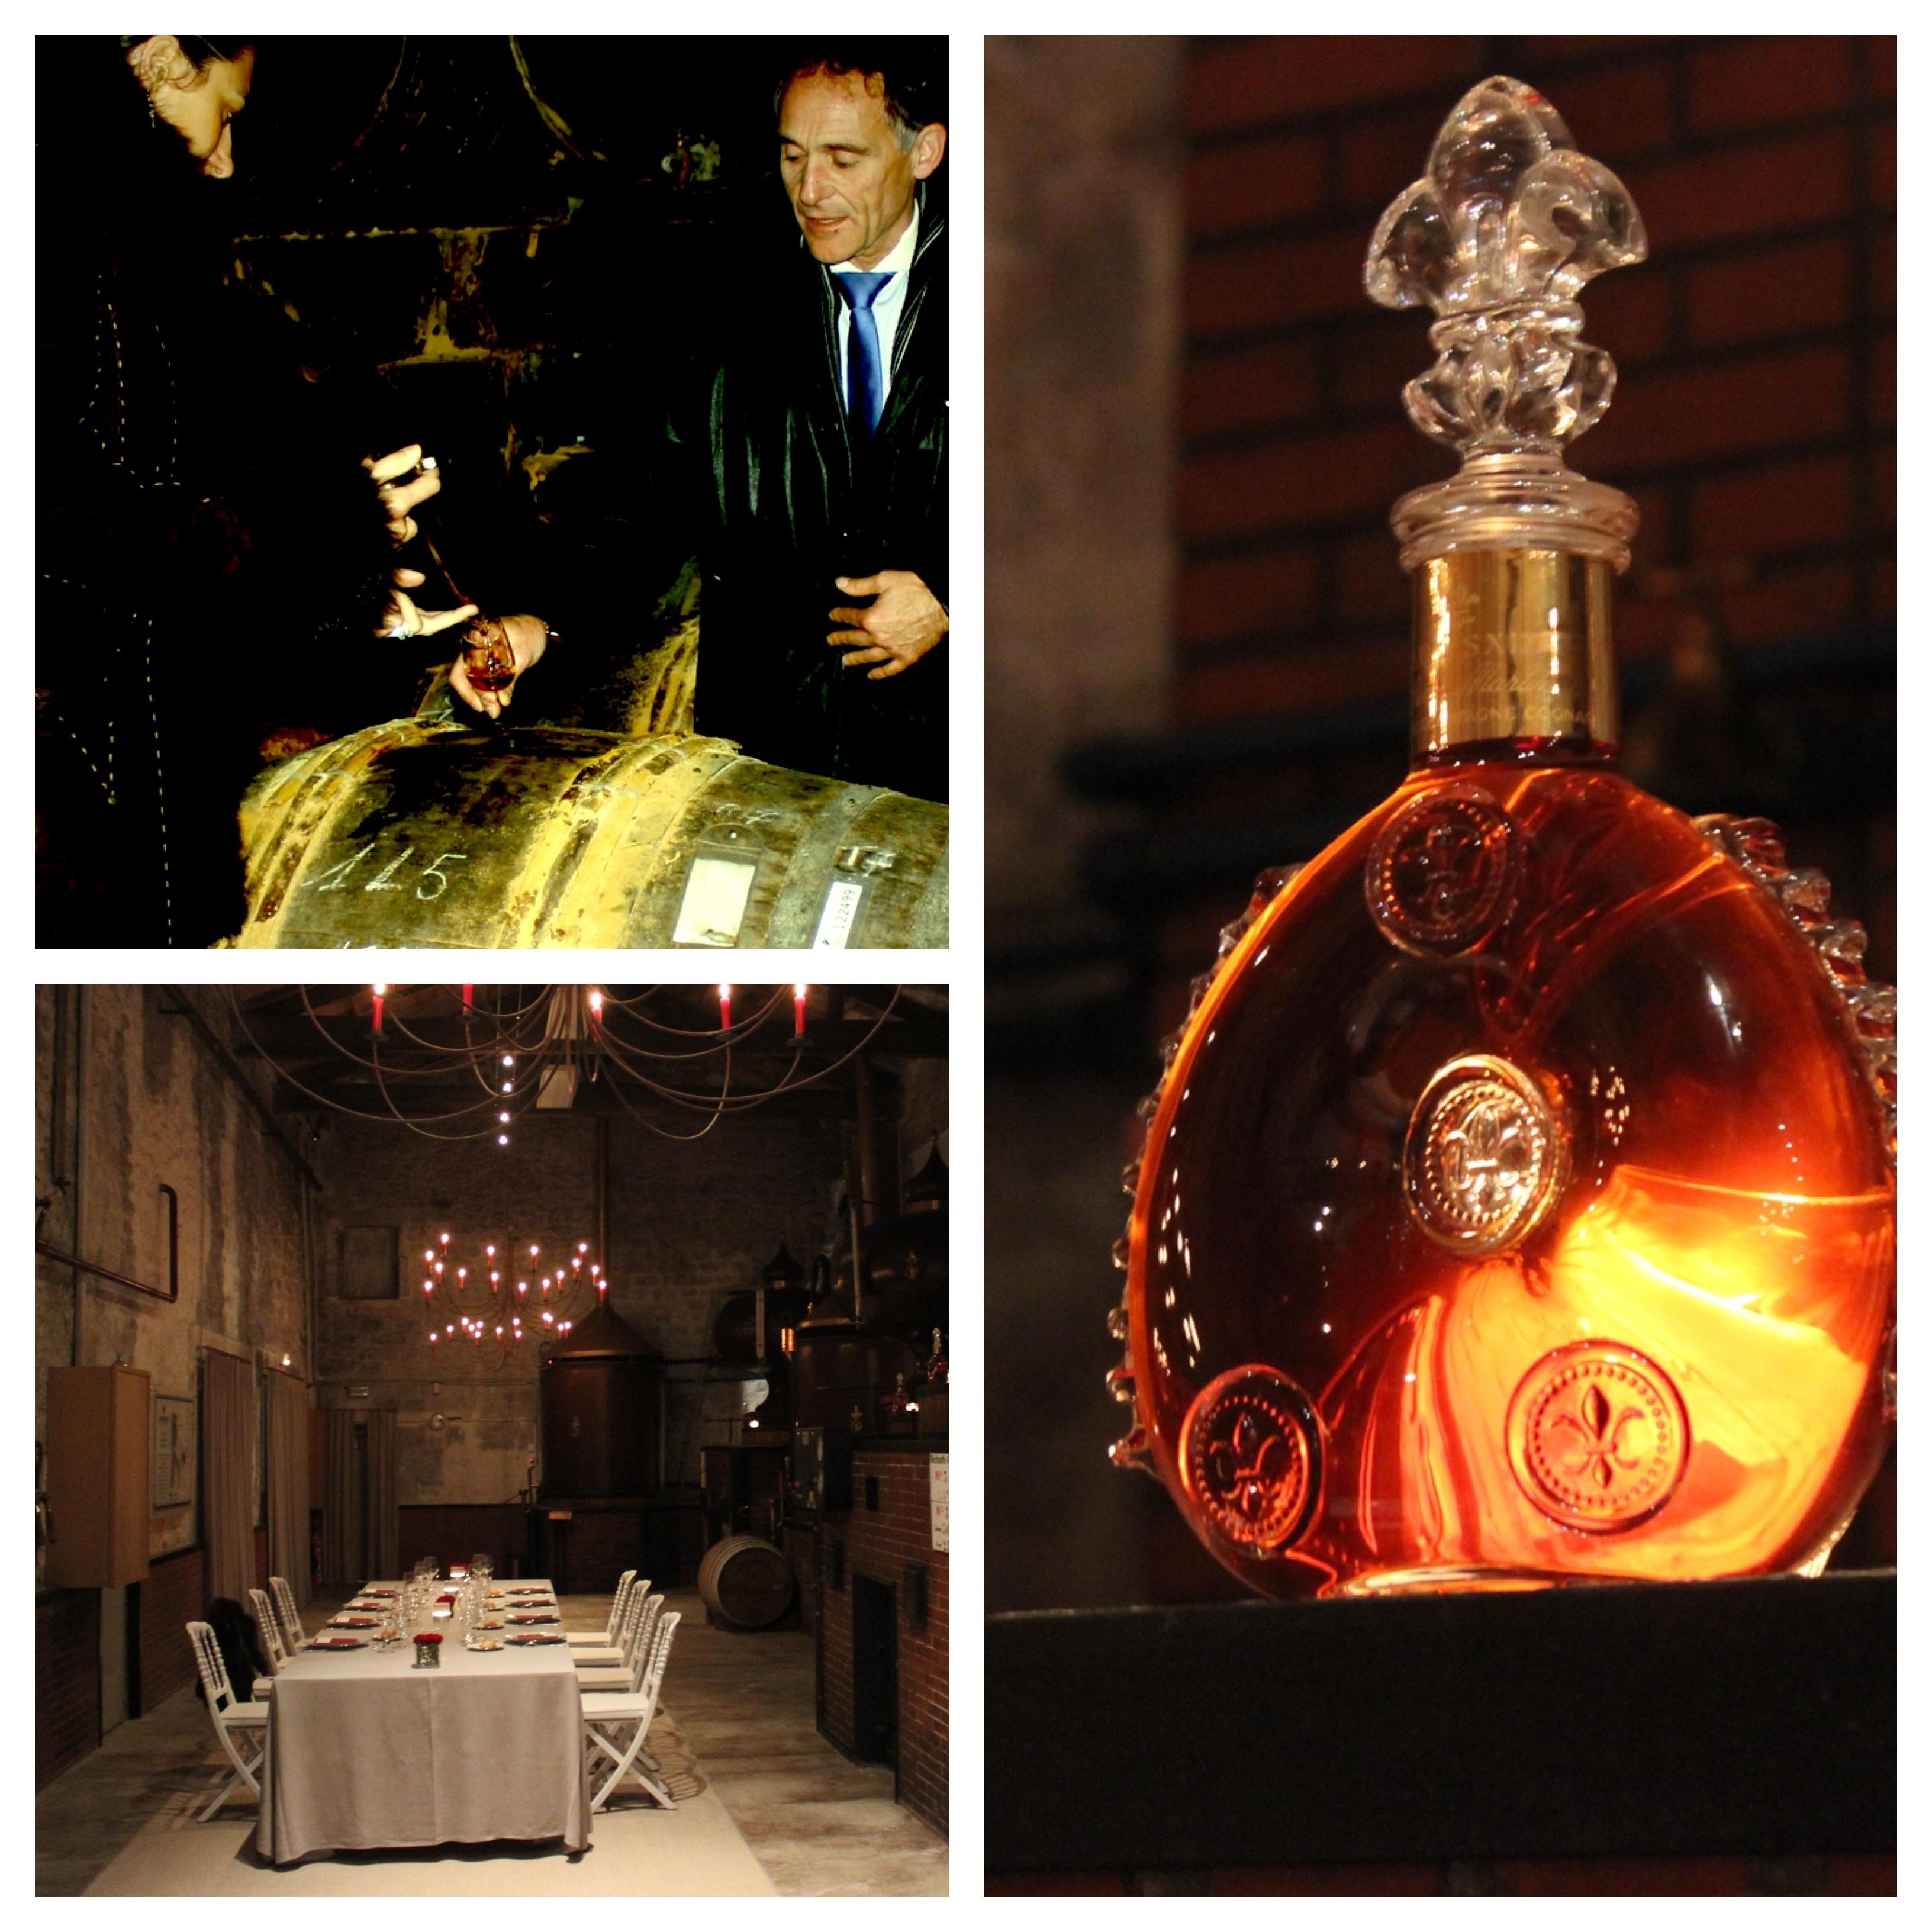 Louis XIII tasting in an old distillery